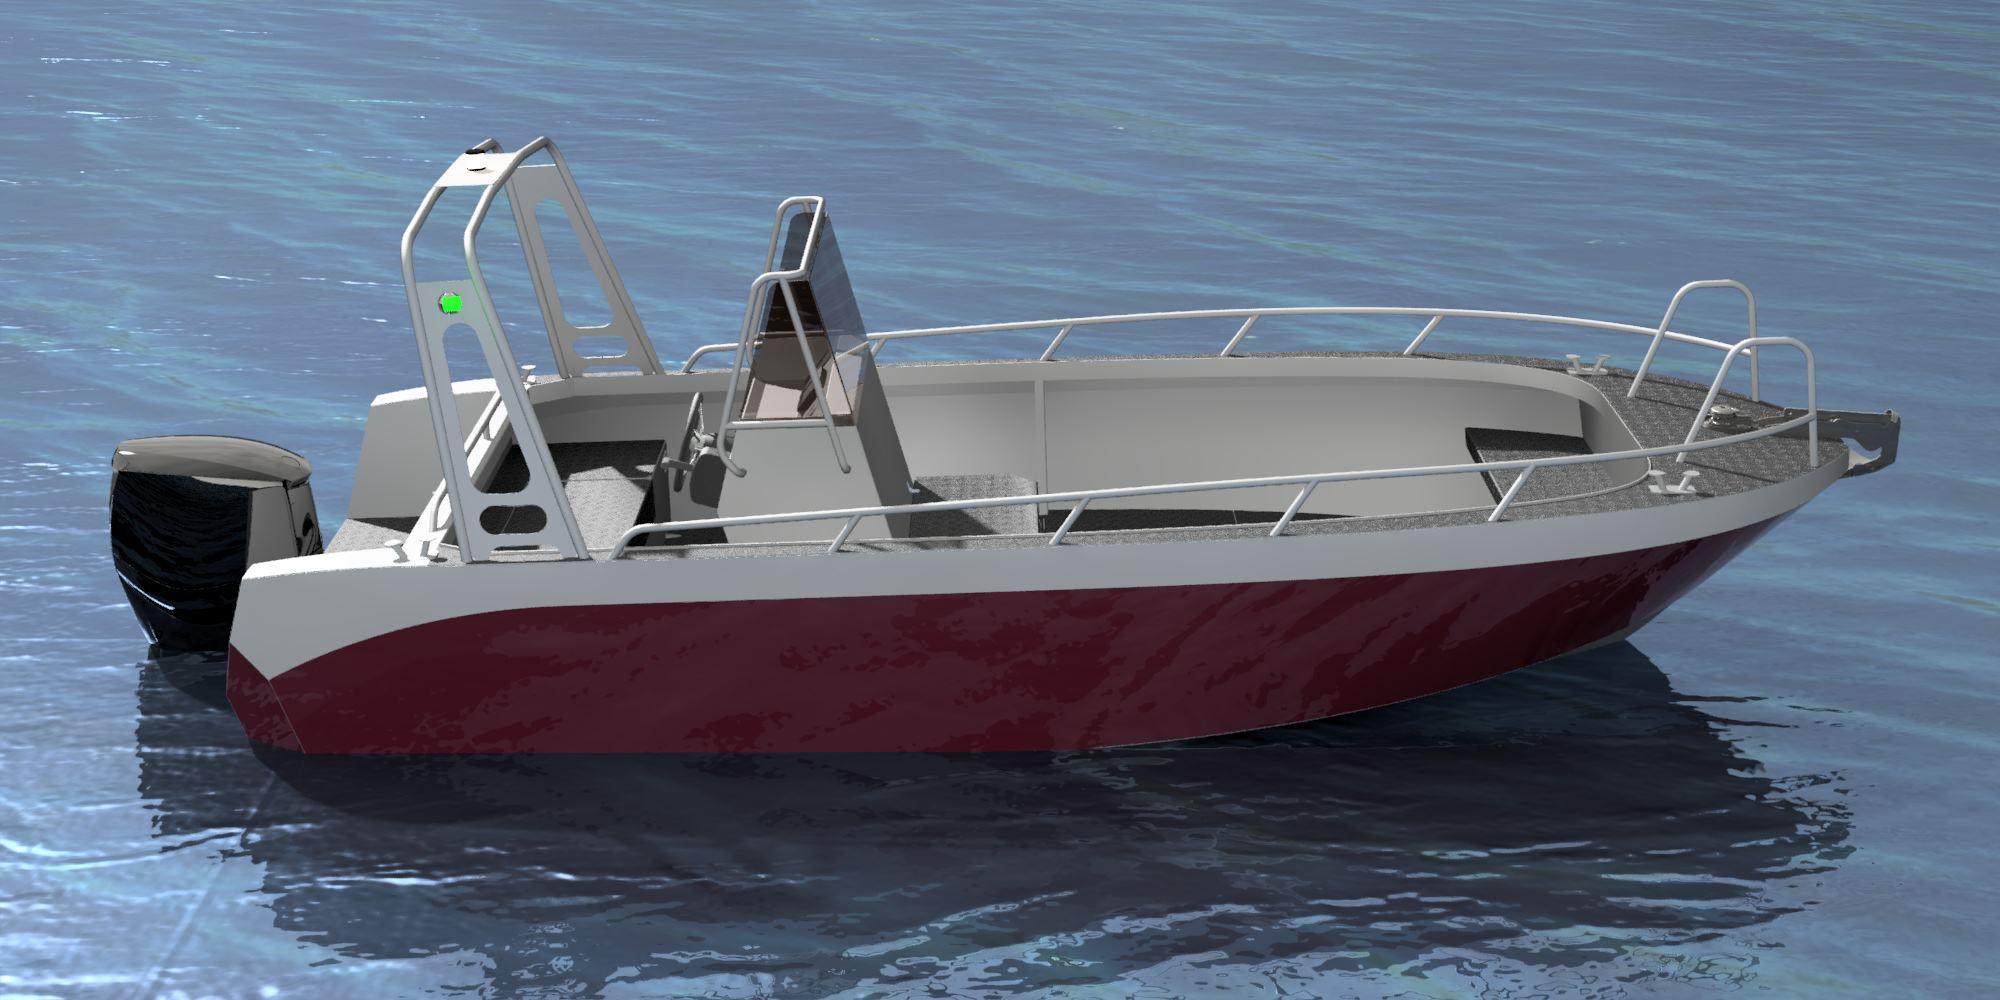 a600-aluminium铝壳船小游艇3D数模图纸 STP